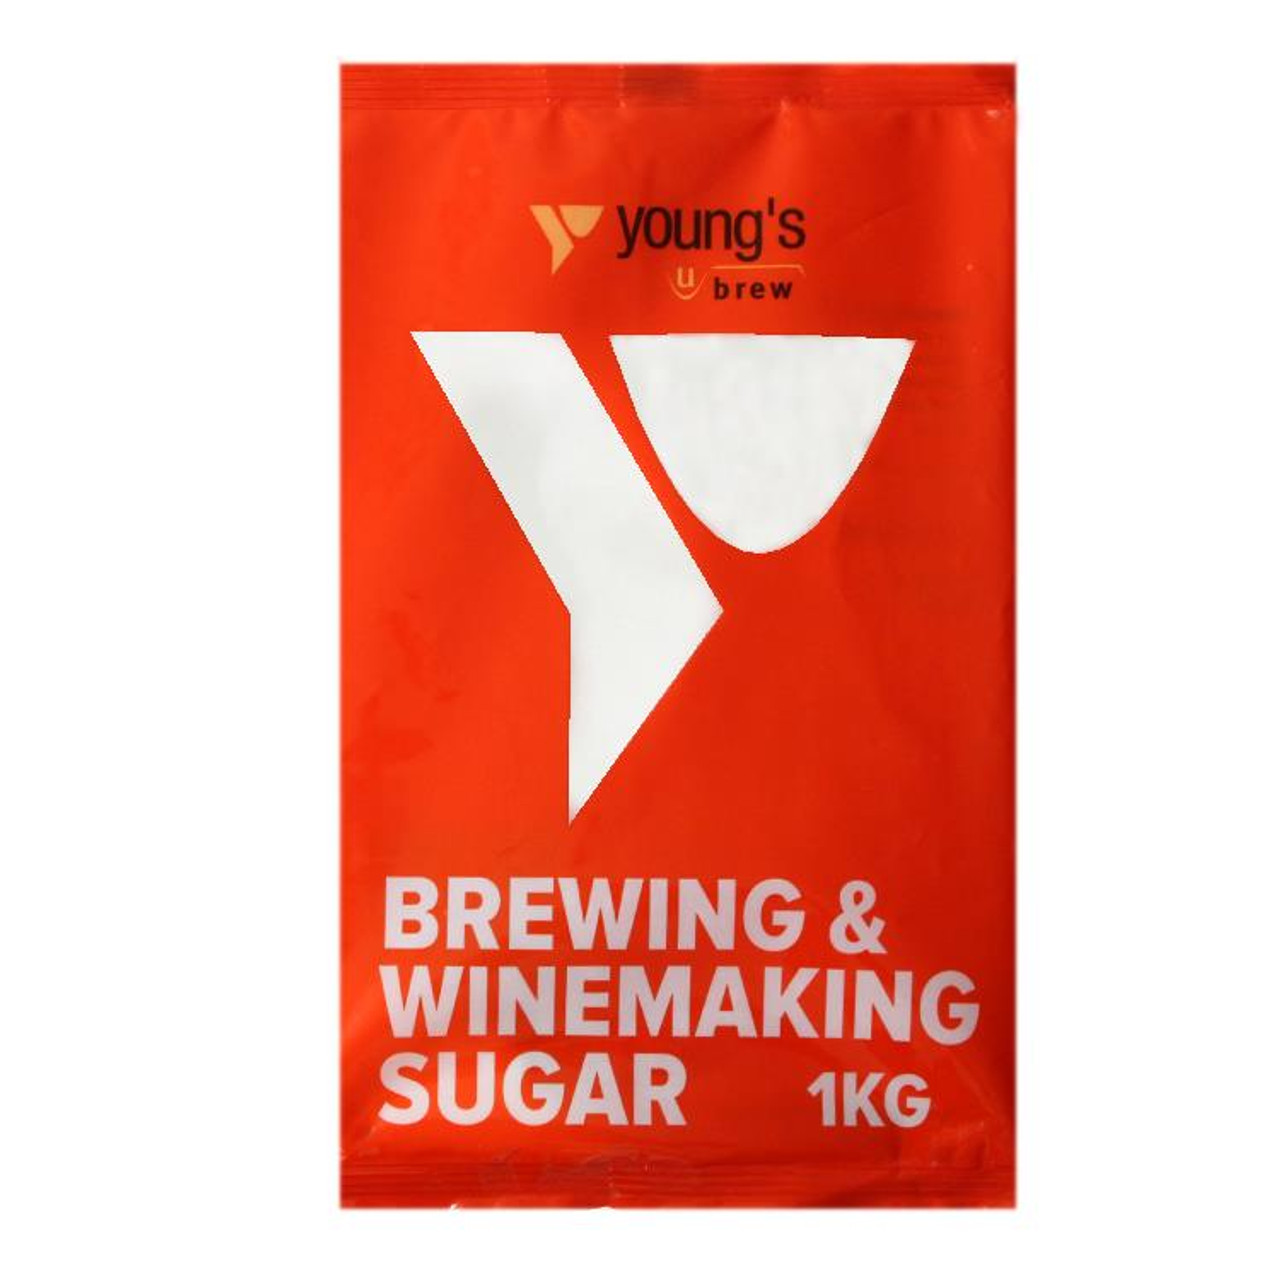 Youngs 1kg Brewing & Winemaking Sugar